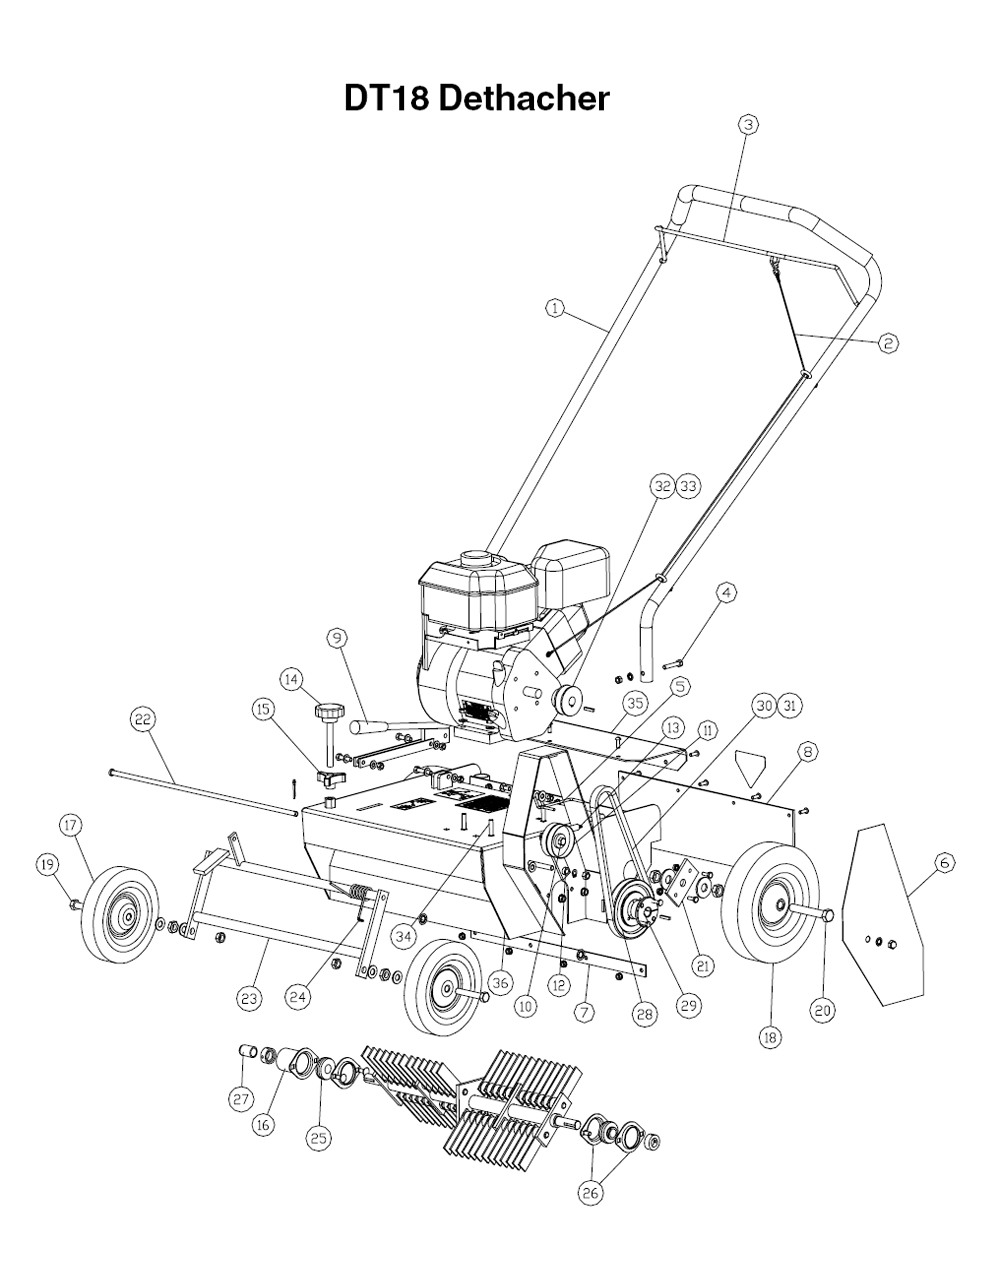 Buy Husqvarna DT18 (968981007) Replacement Tool Parts